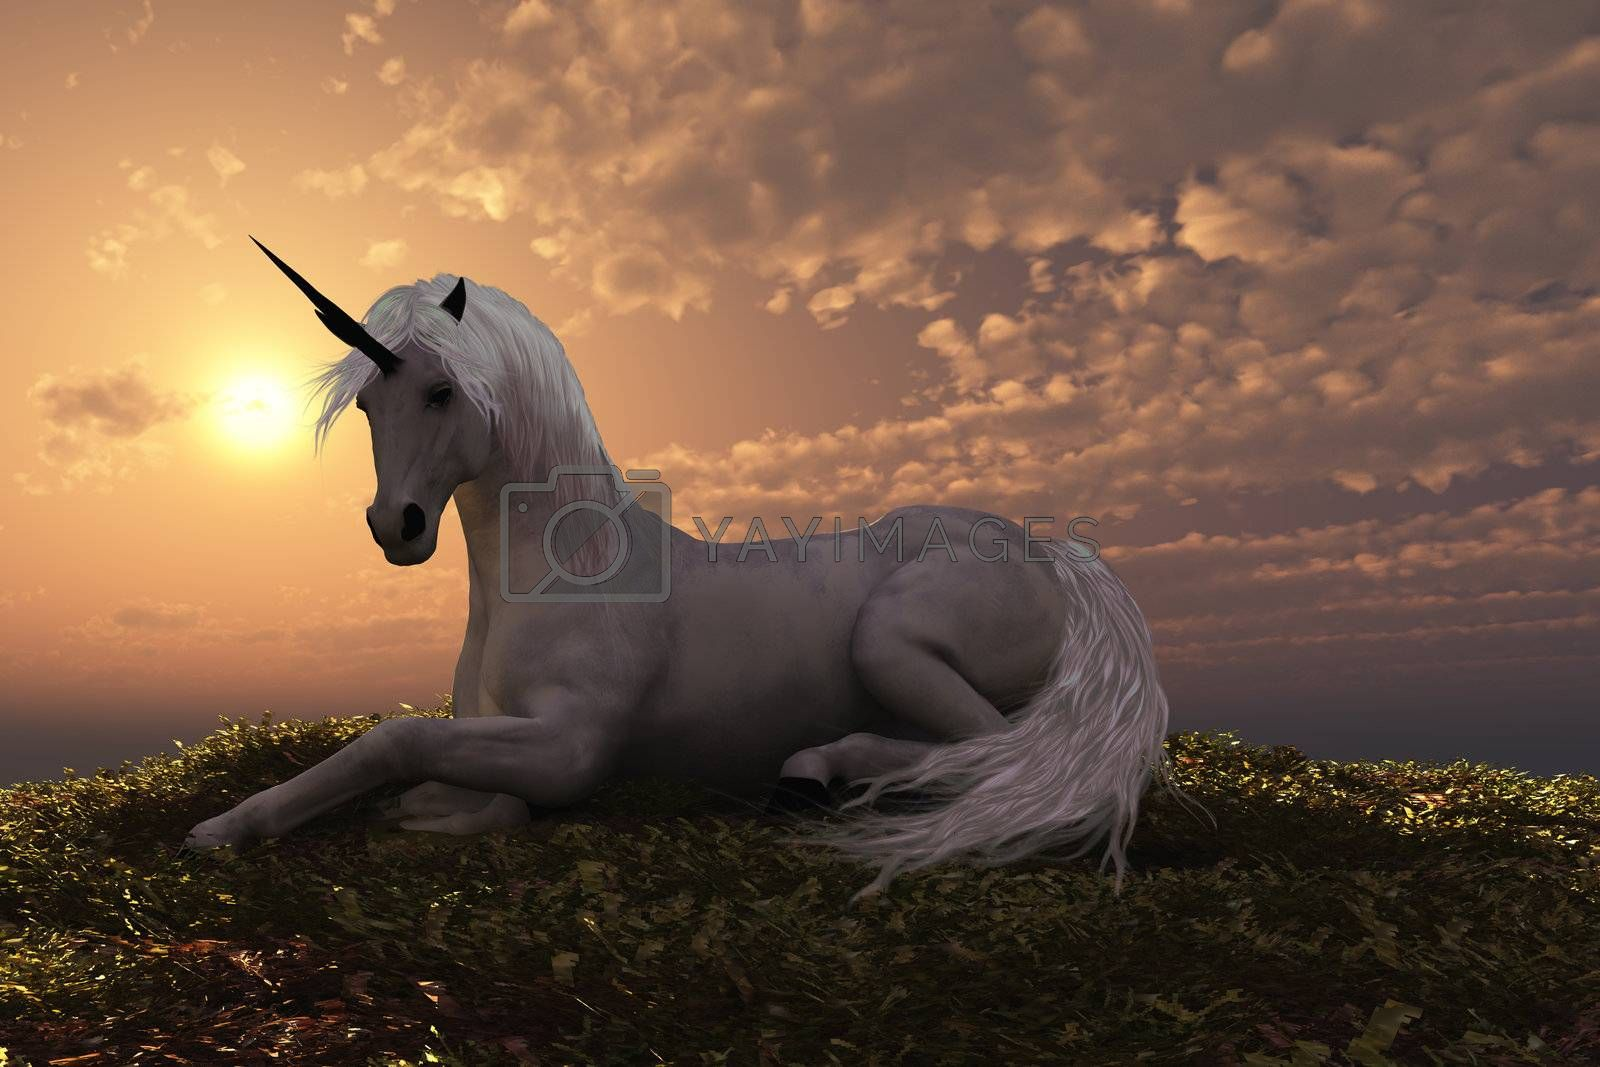 Royalty free image of UNICORN by Catmando